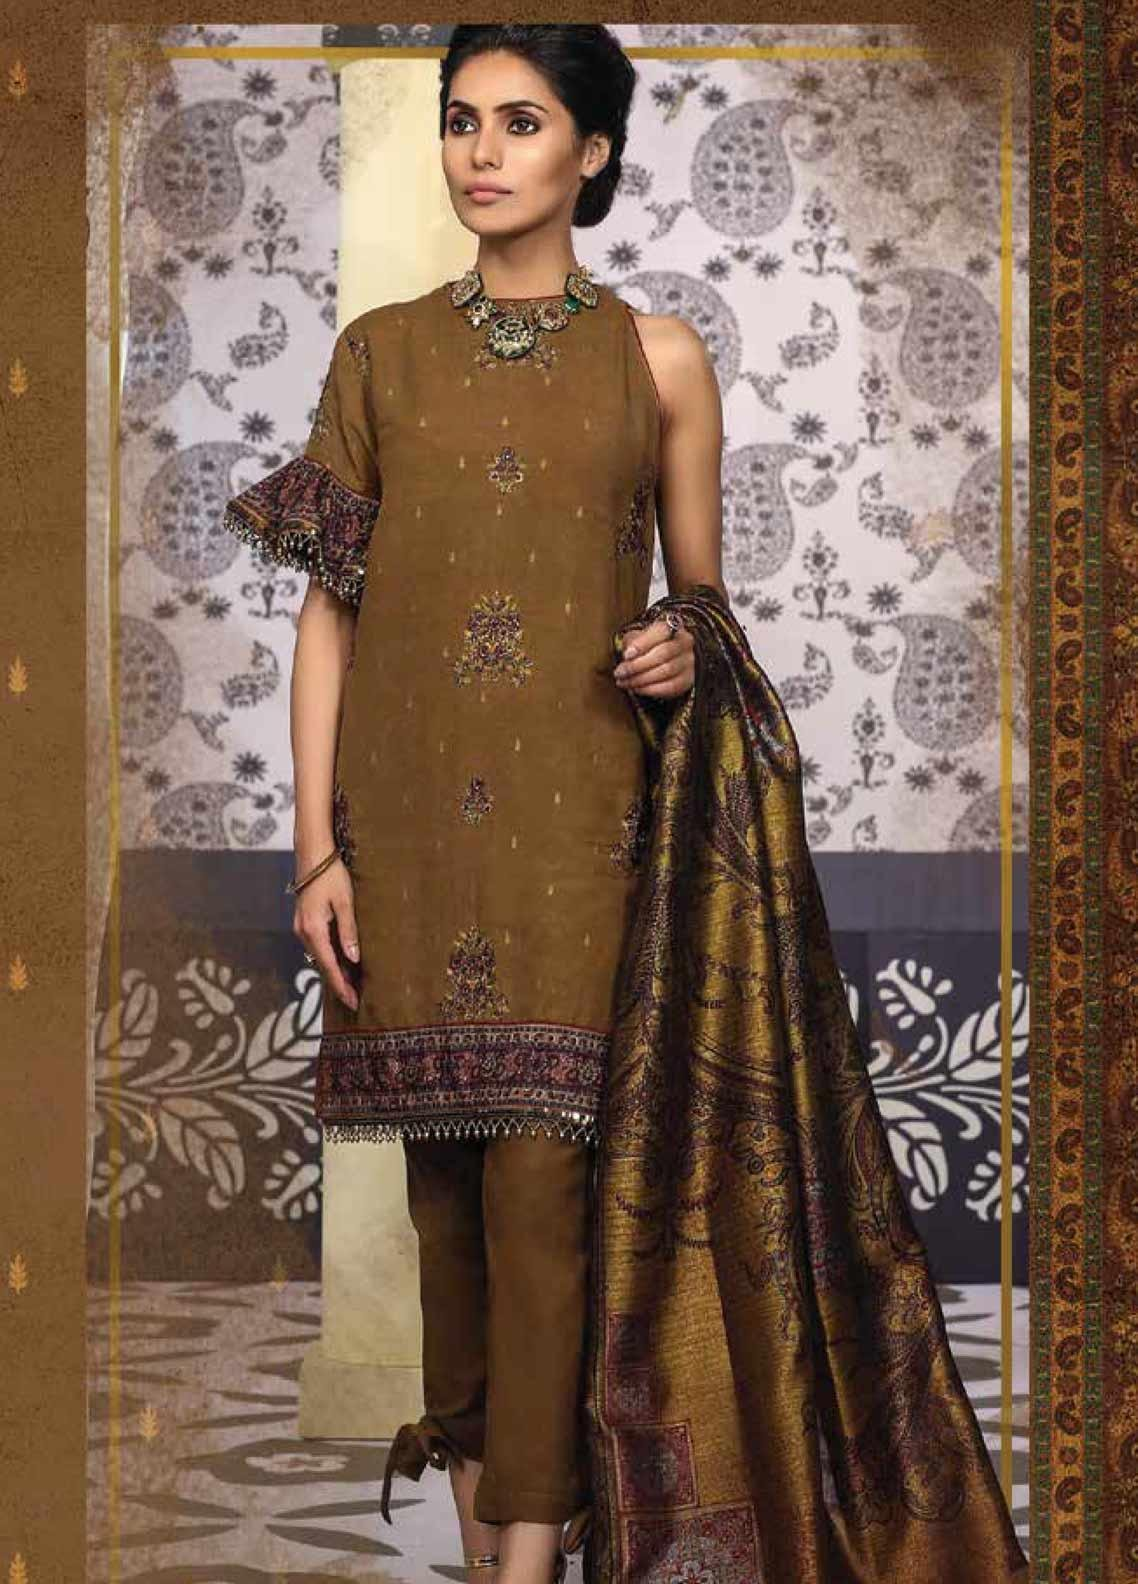 Al Karam Embroidered Cotton Silk Unstitched 3 Piece Suit AK19-F2 13G Brown - Festive Collection